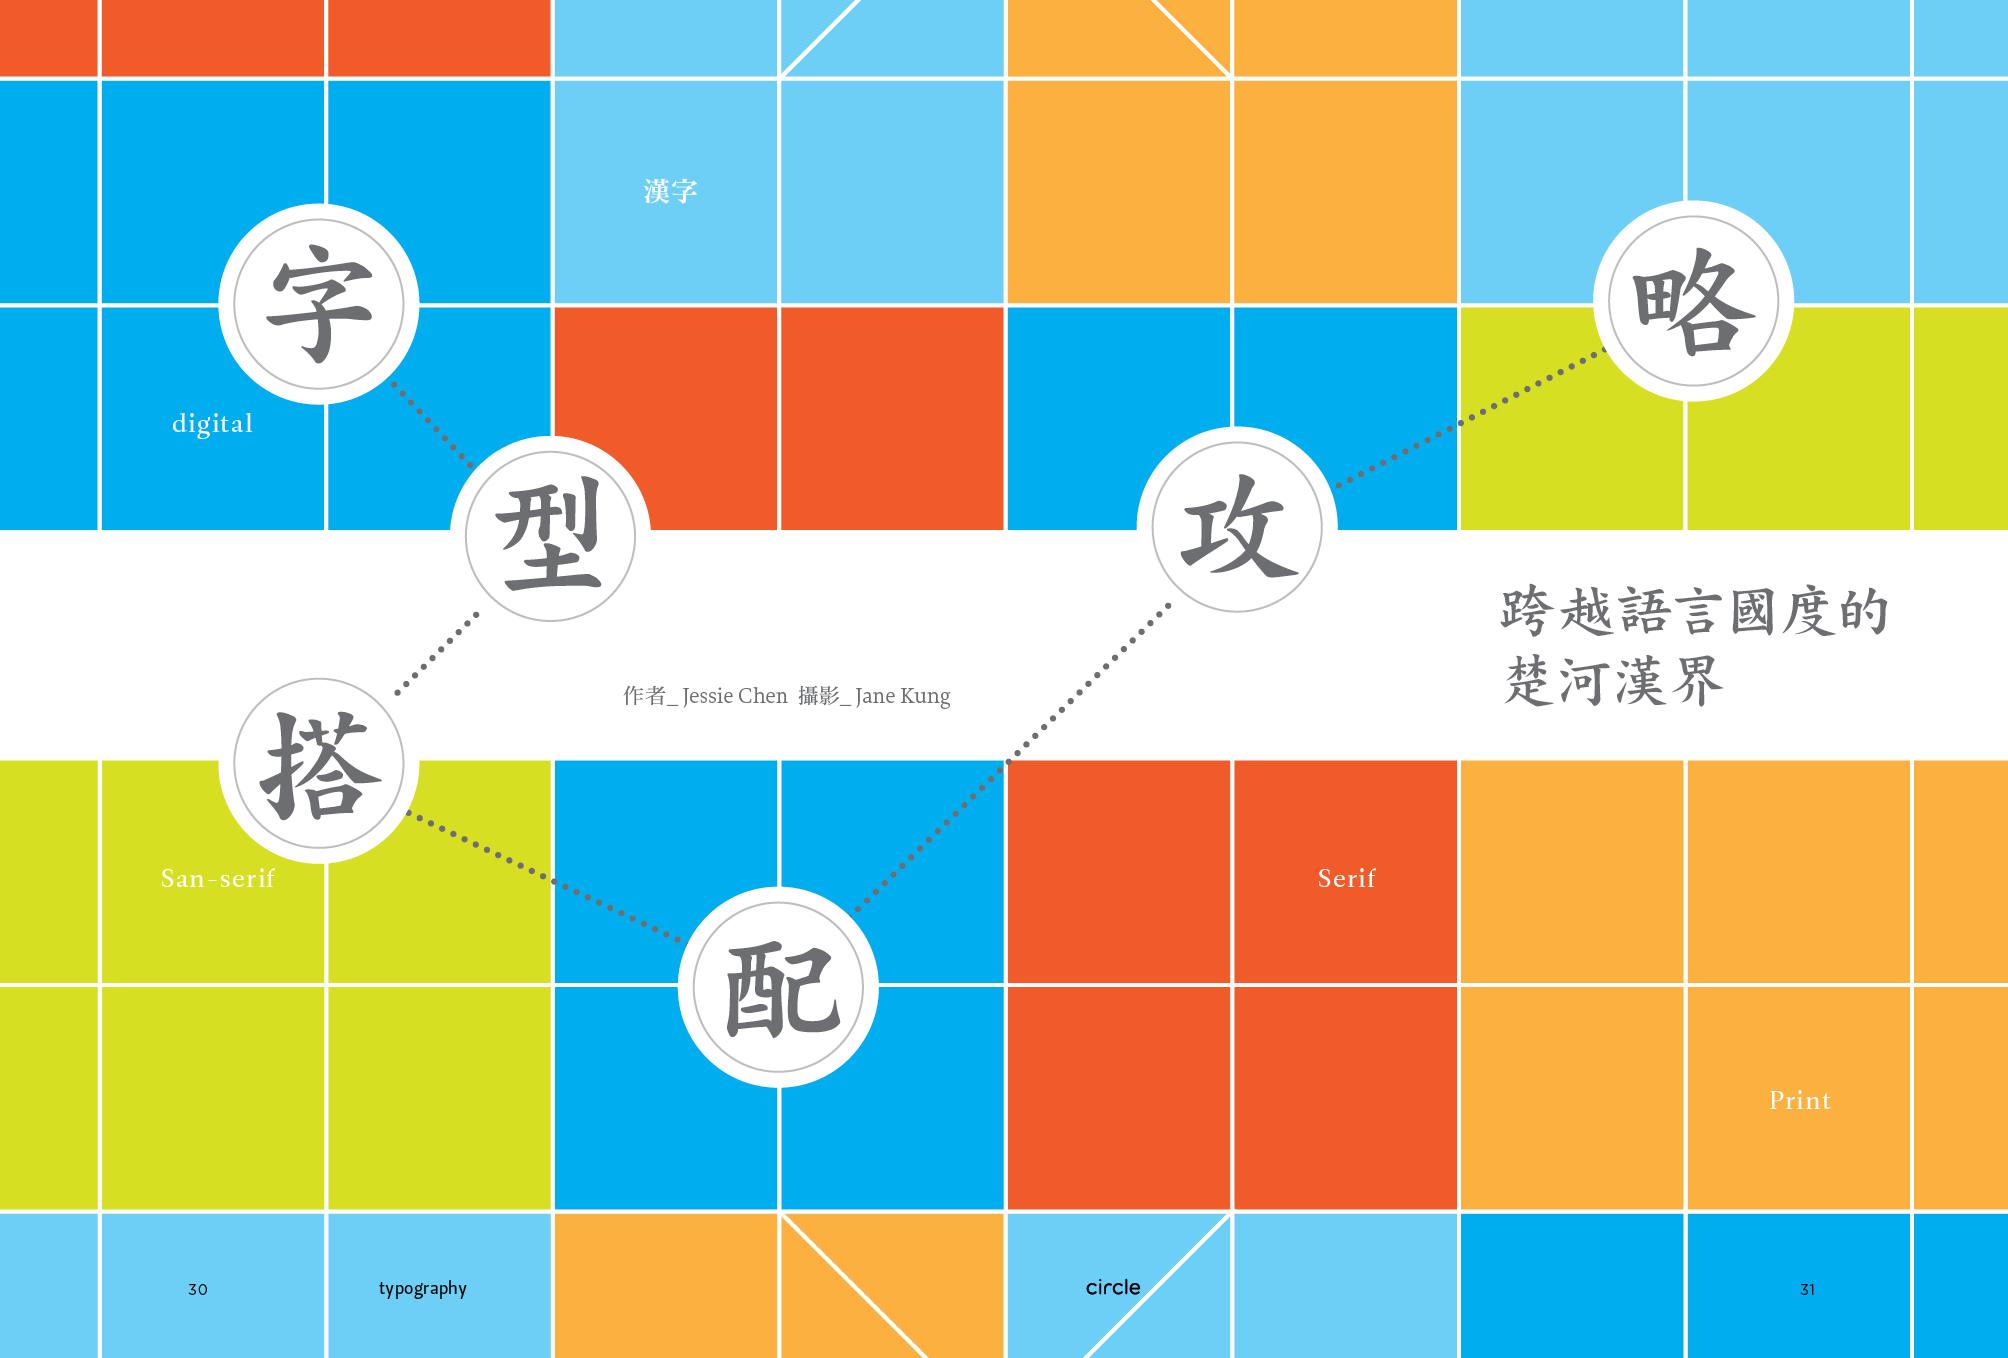 Circle 5-4_spread 3_201501-02